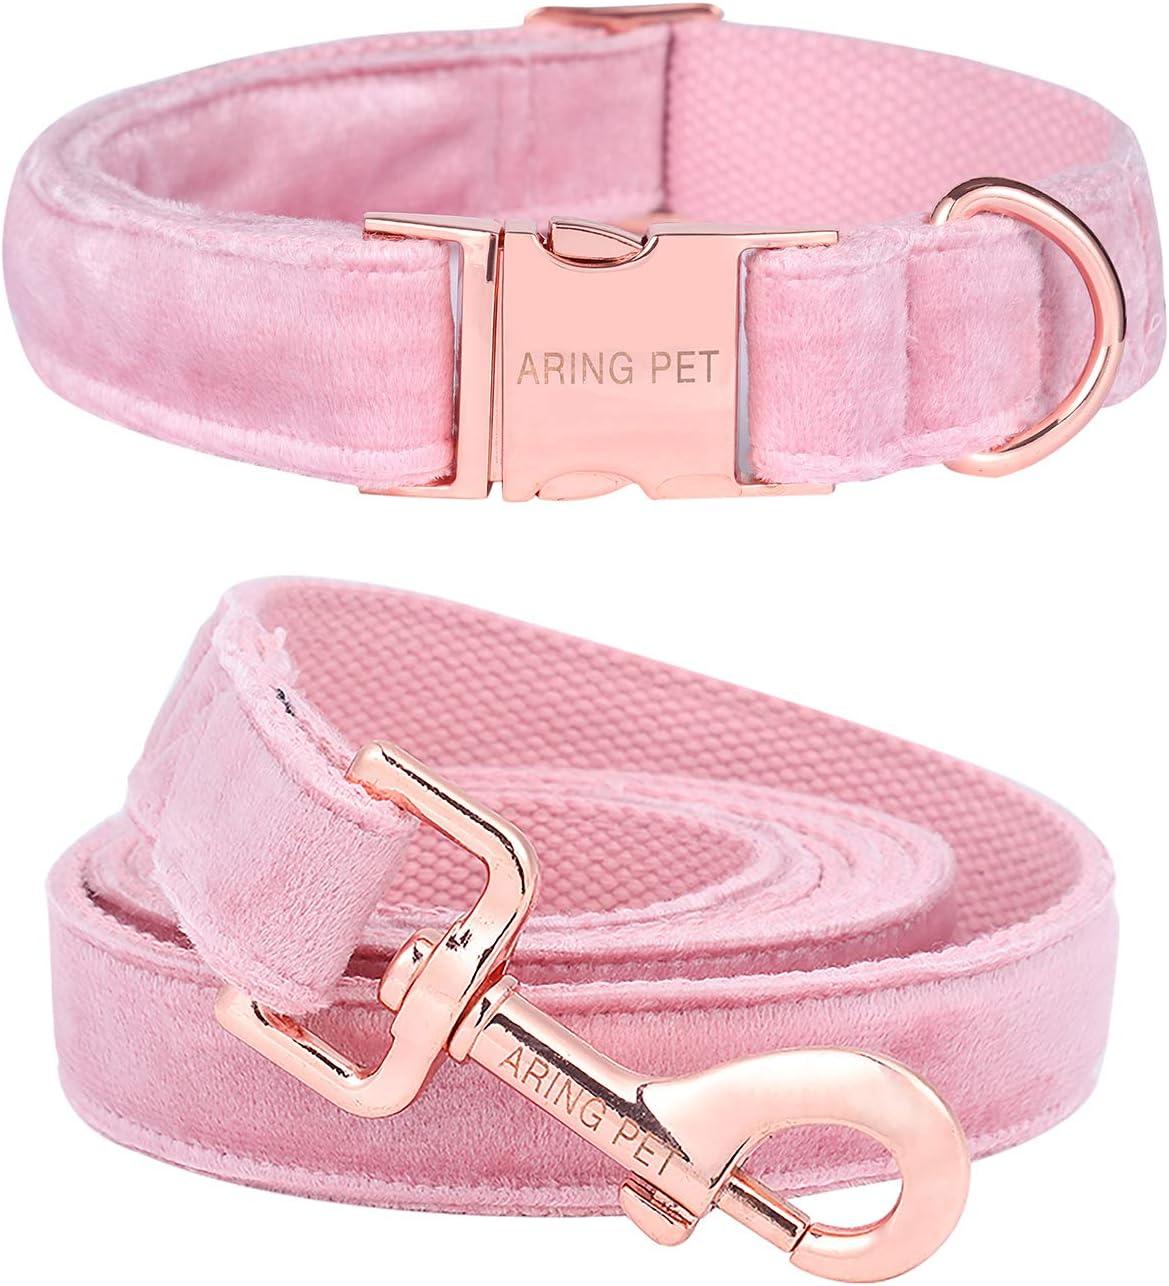 ARING PET Dog Collar Velvet and Cash special price Set Great interest Leash